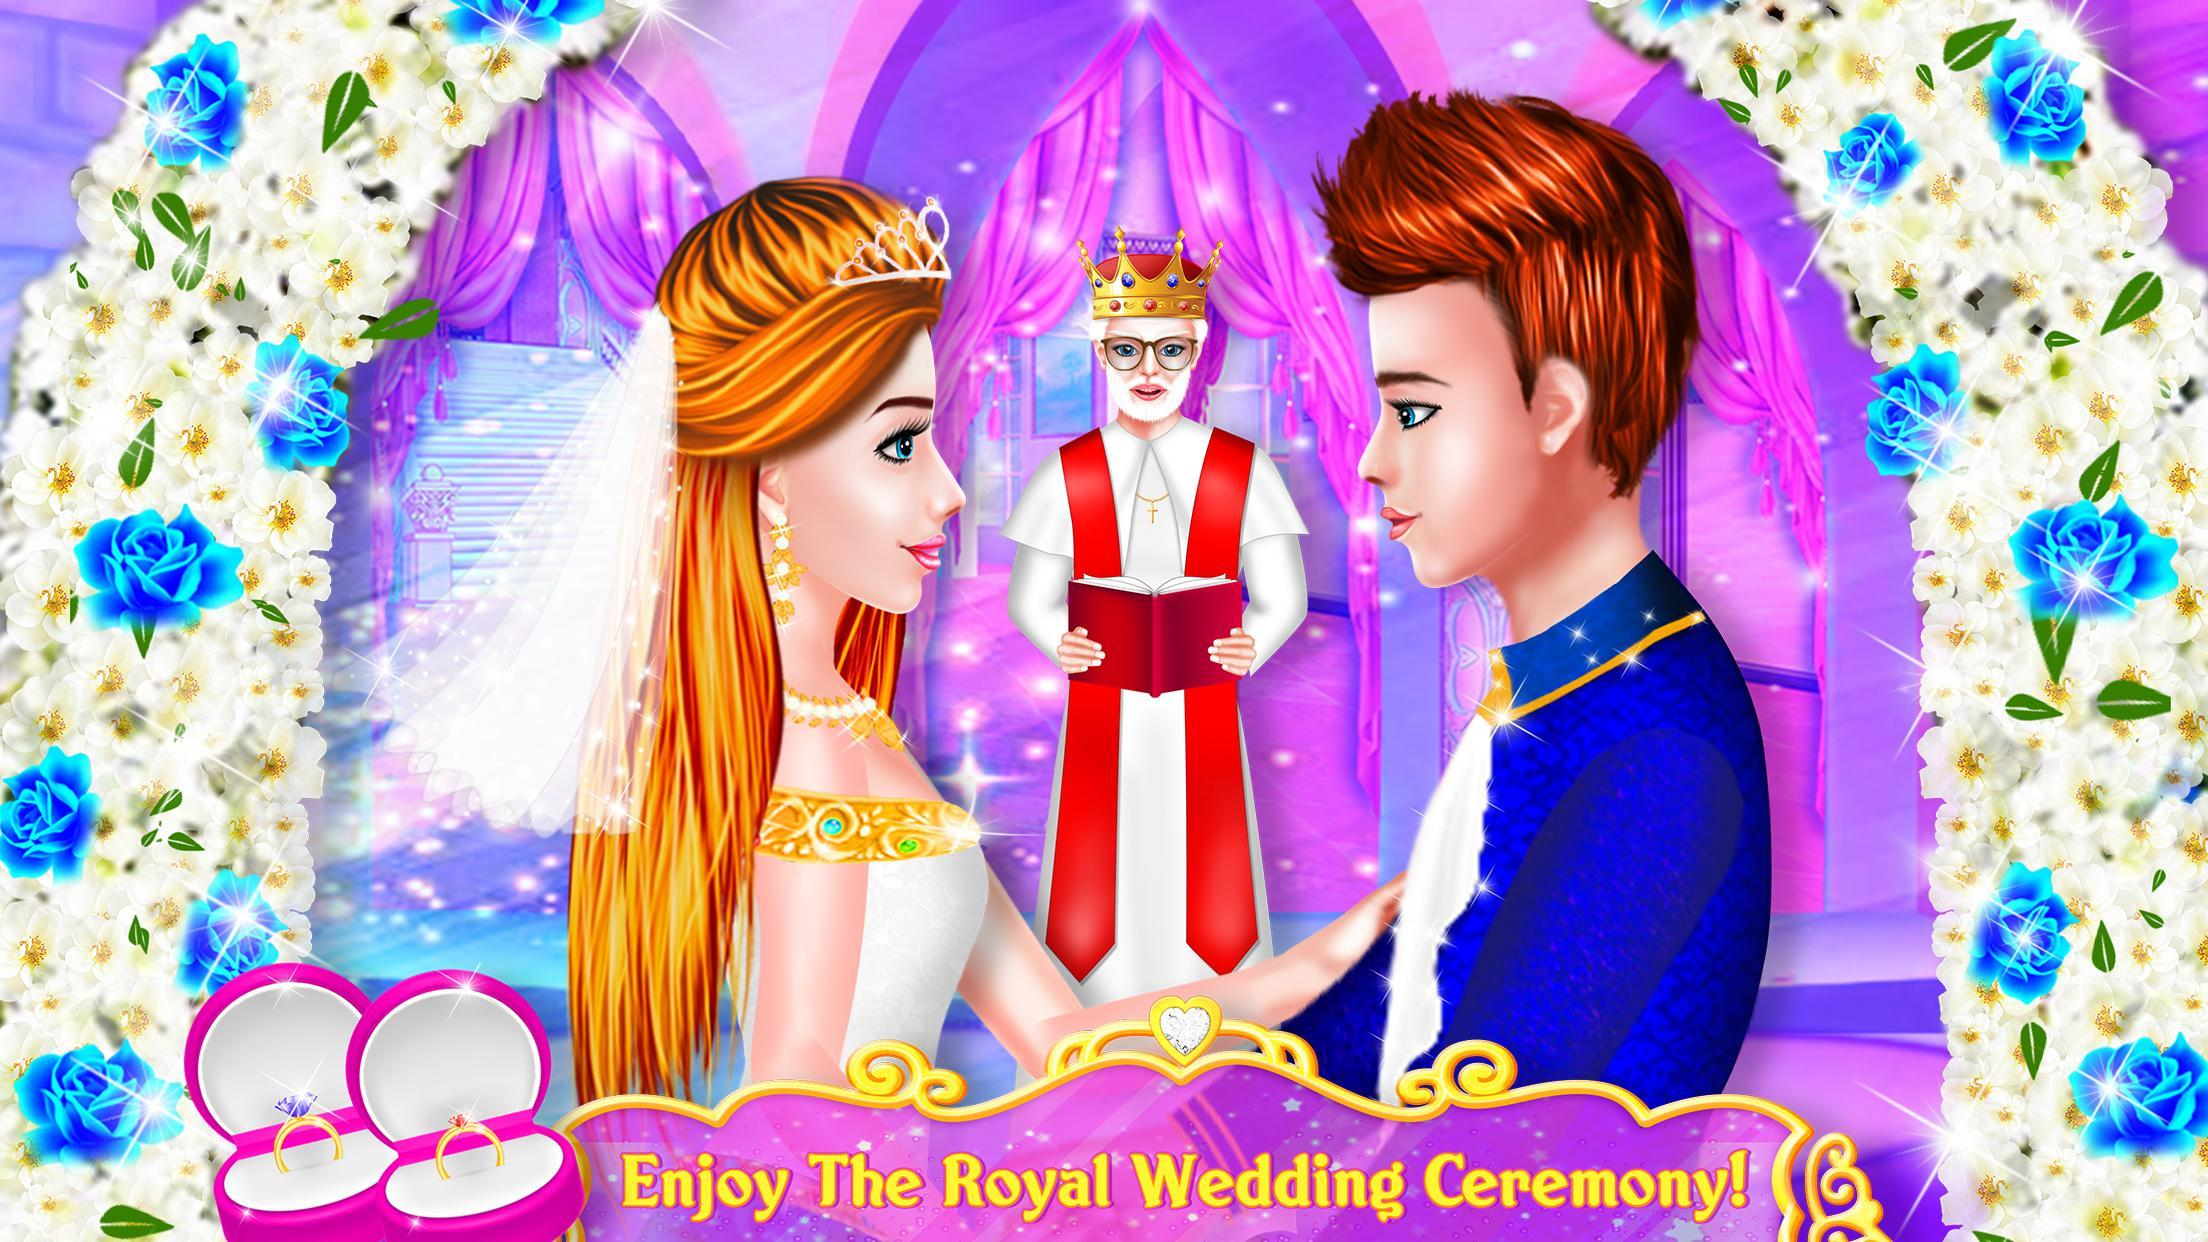 Prince Charles Love Crush Story 1.7 Screenshot 6